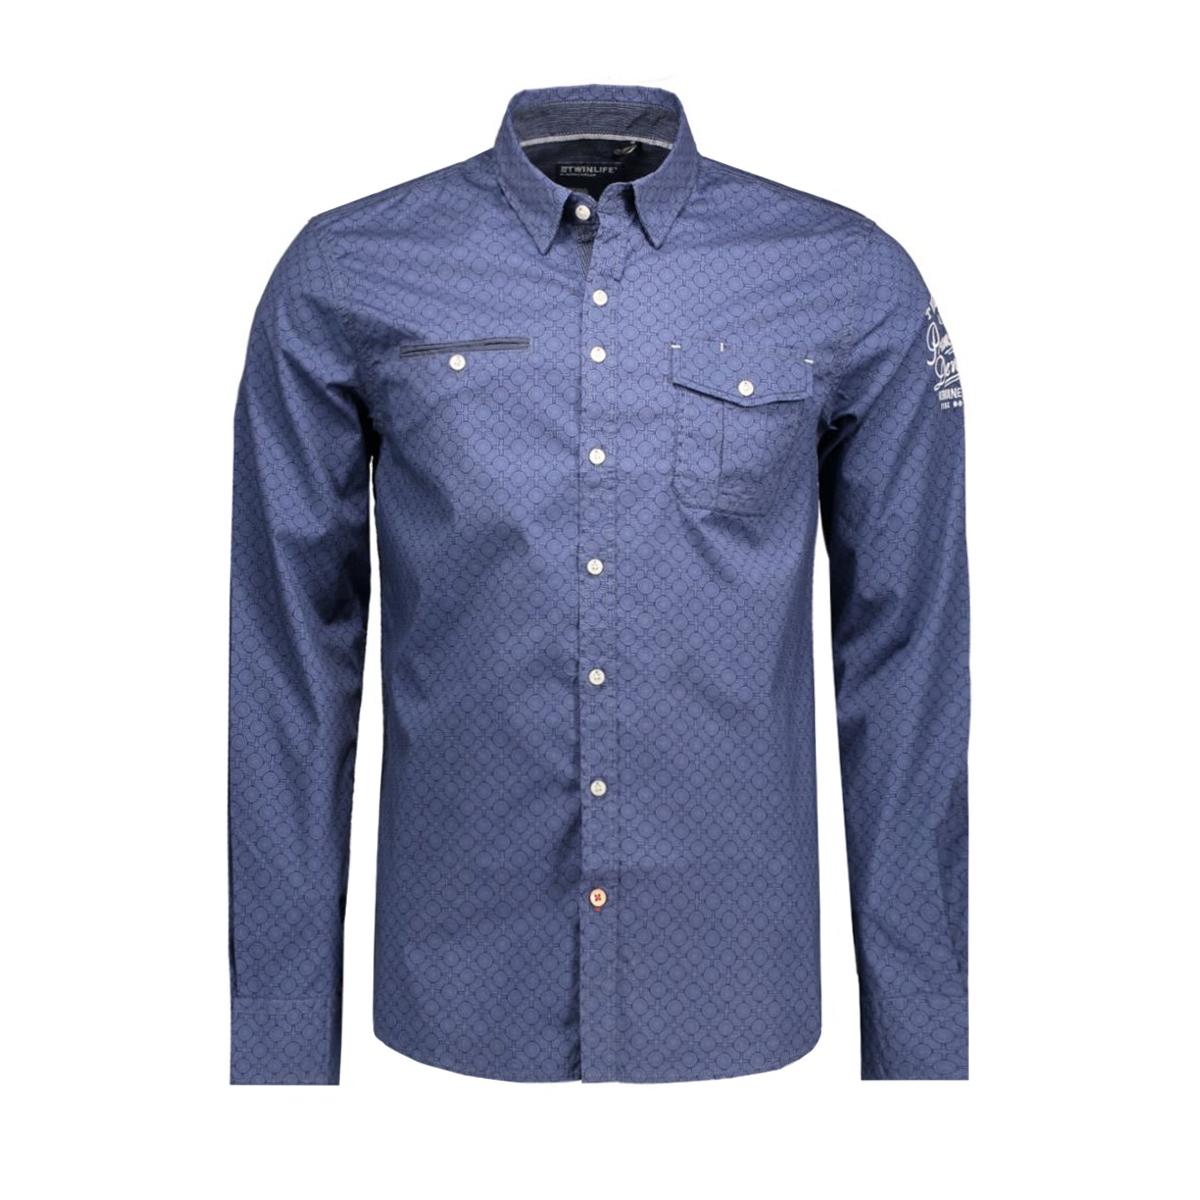 msh651636 twinlife overhemd 6511